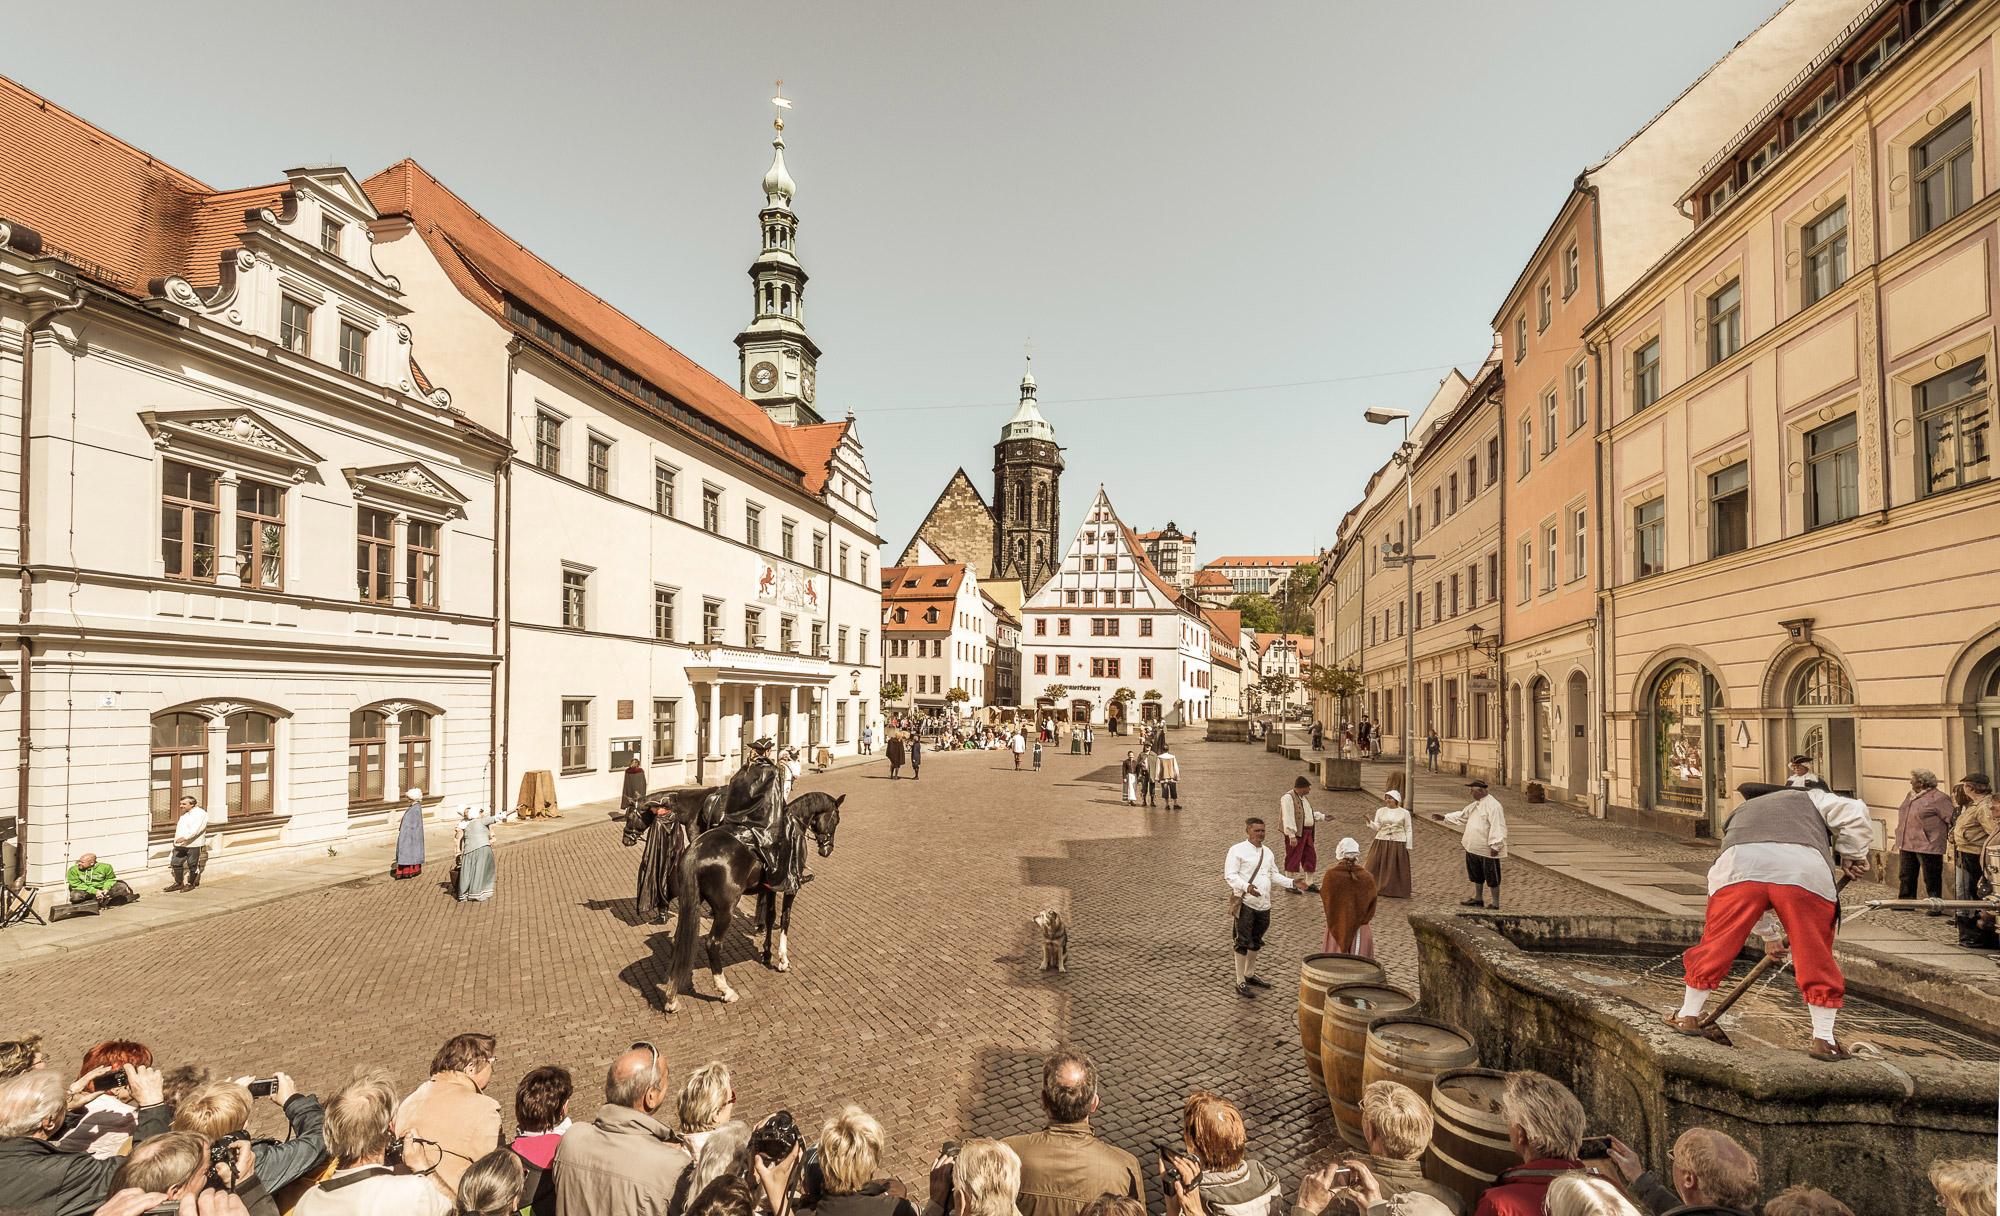 De mooiste steden in Saksen - Pirna